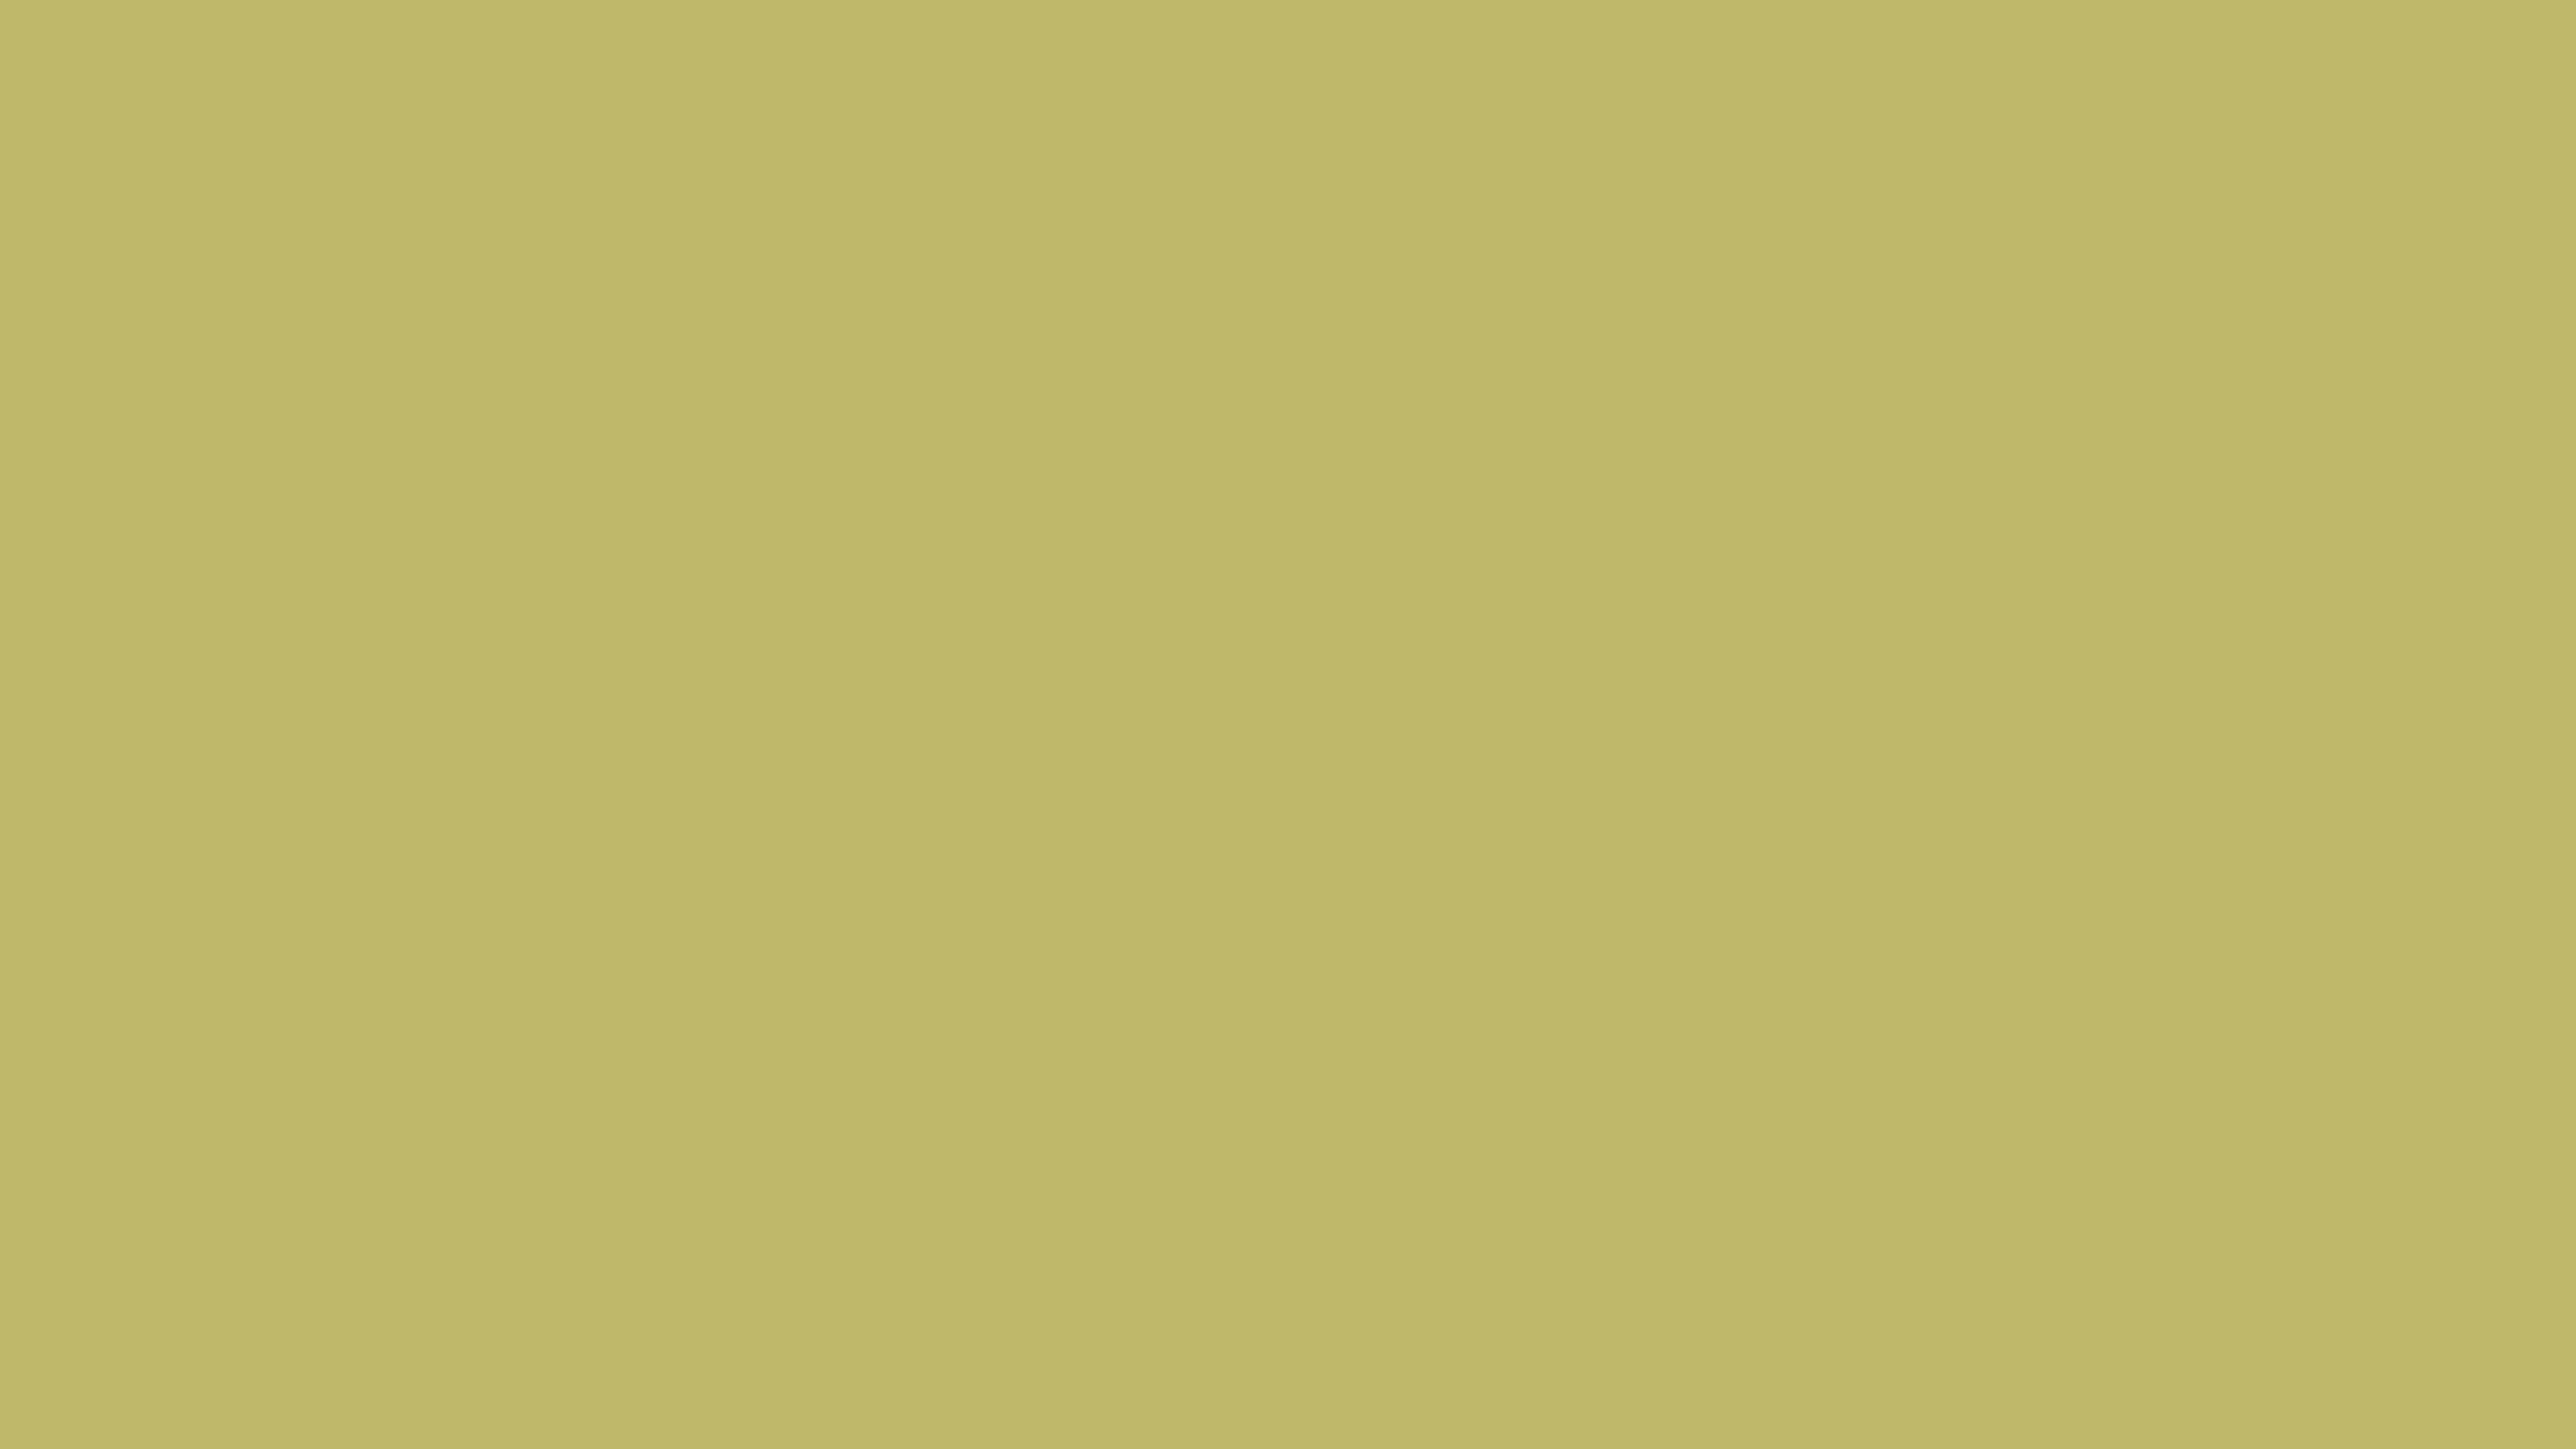 4096x2304 Dark Khaki Solid Color Background